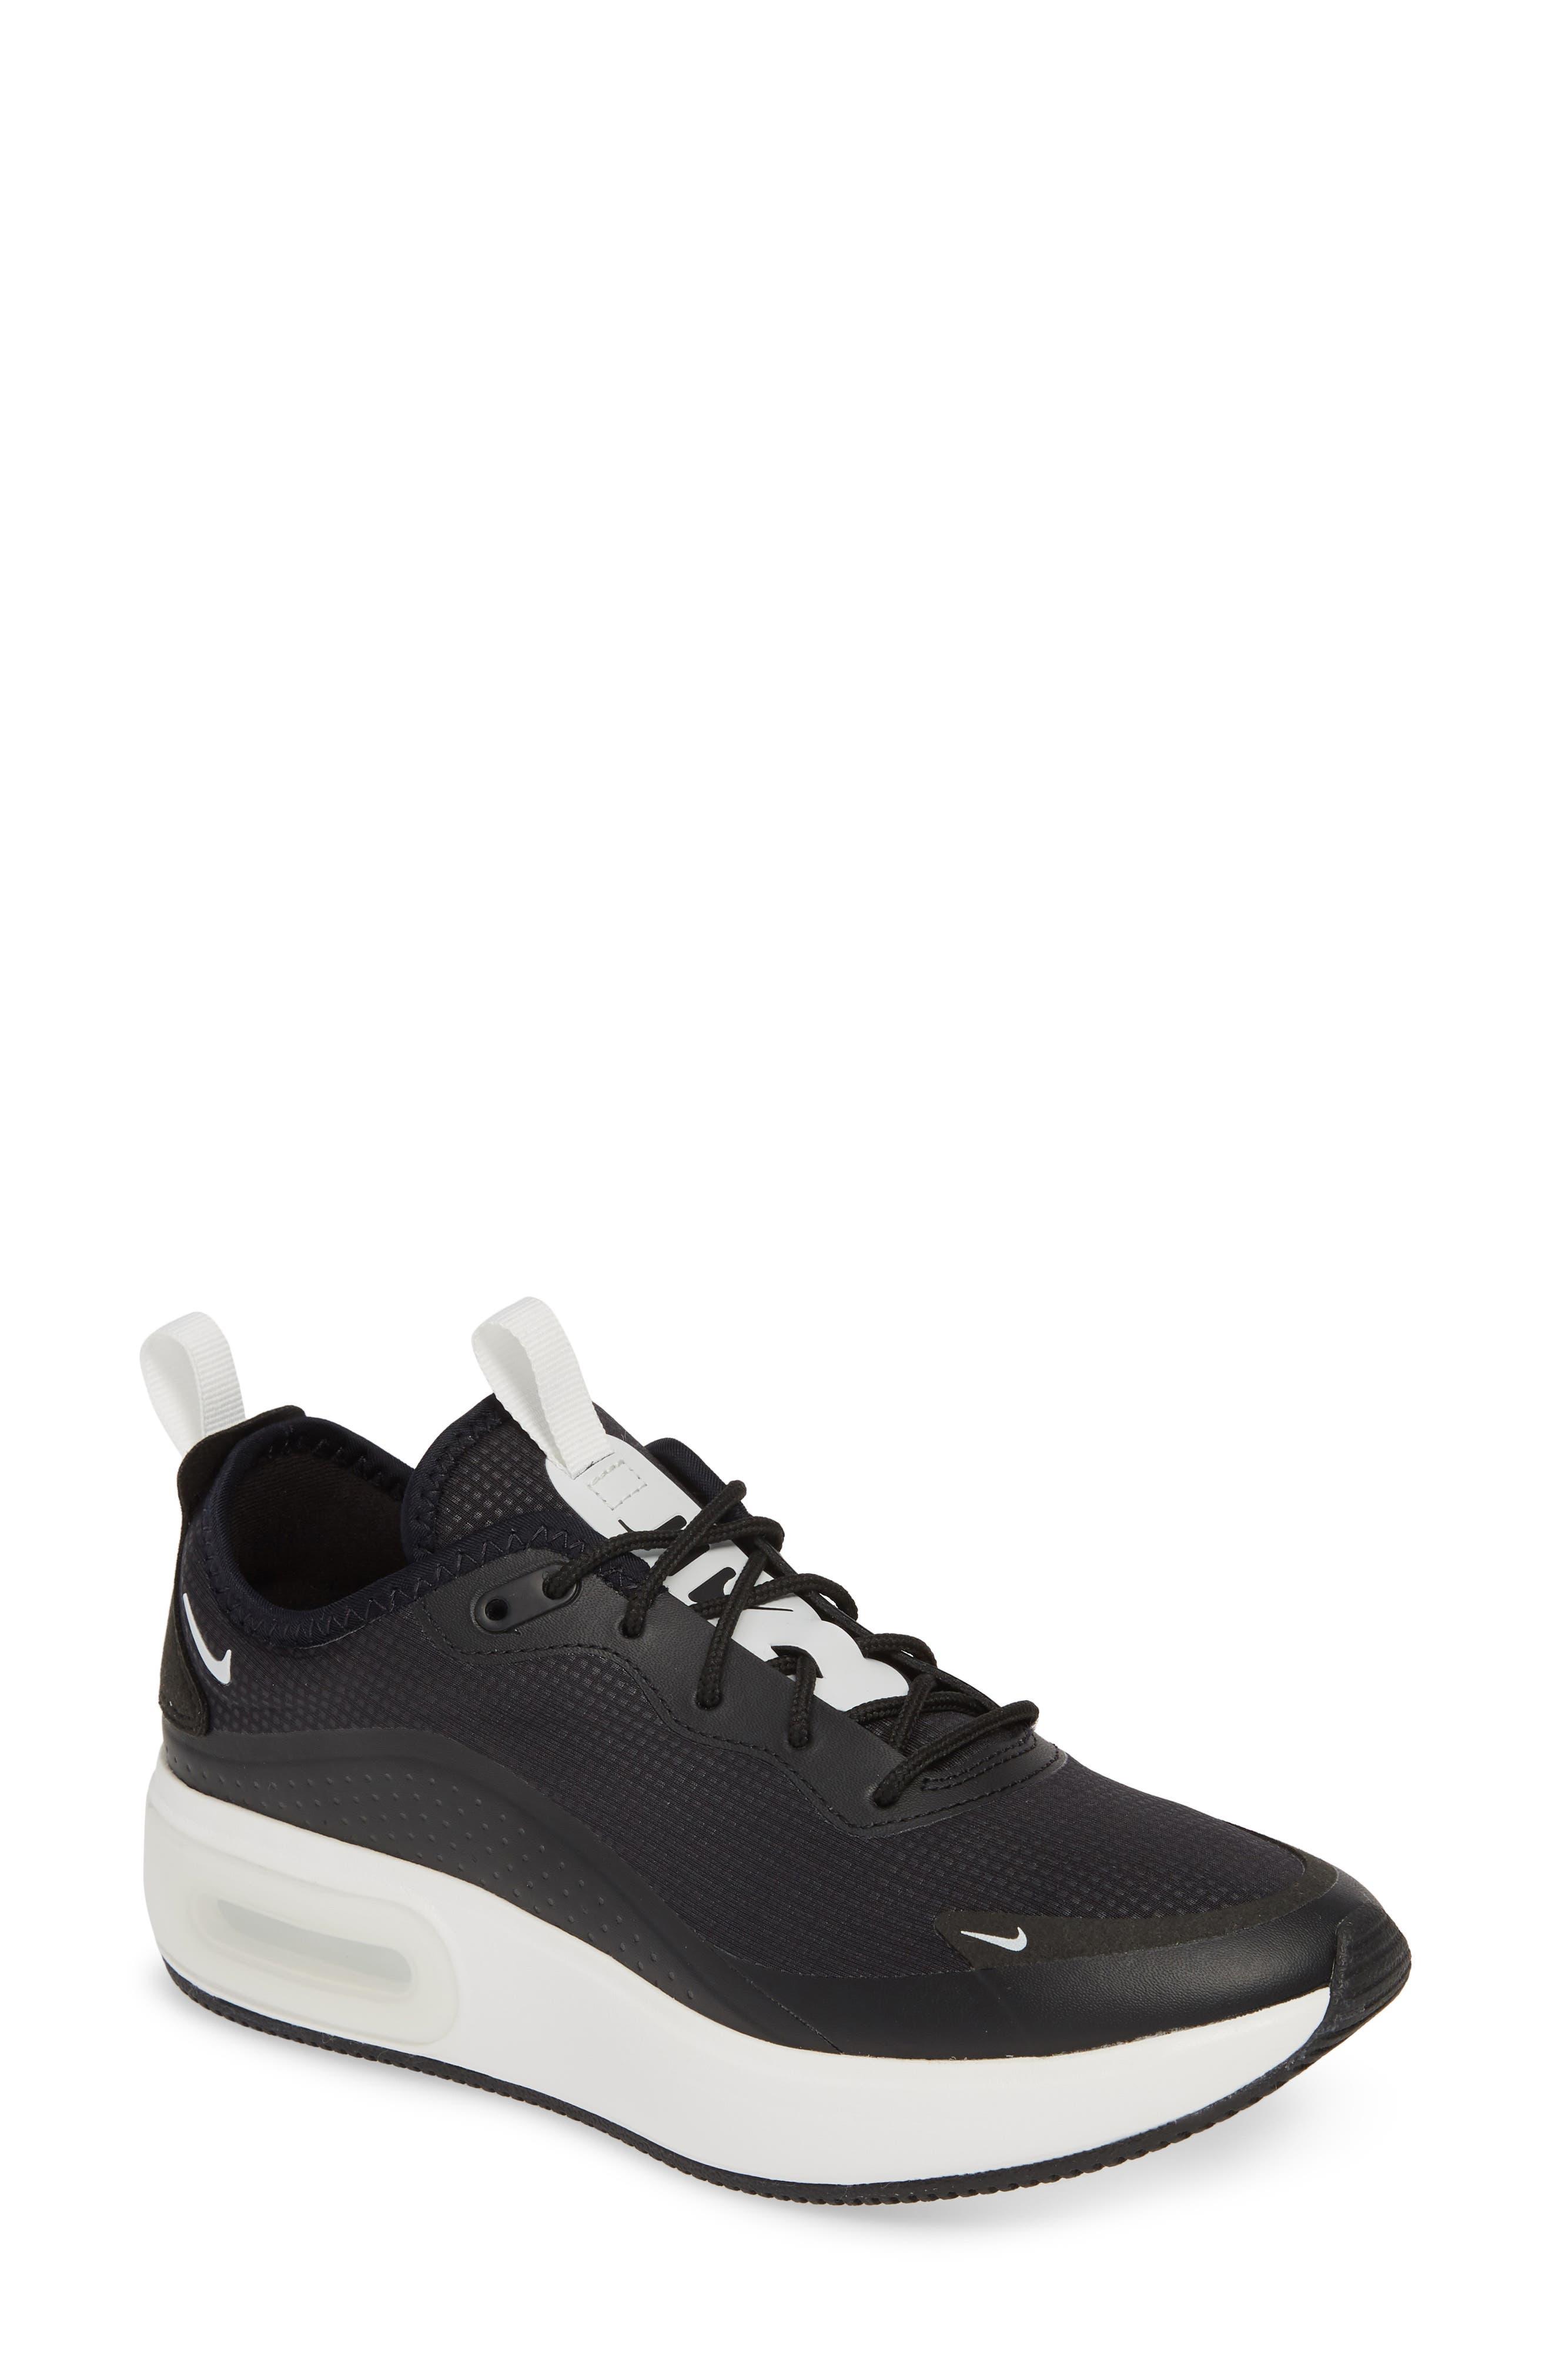 NIKE, Air Max Dia Sneaker, Main thumbnail 1, color, BLACK/ SUMMIT WHITE